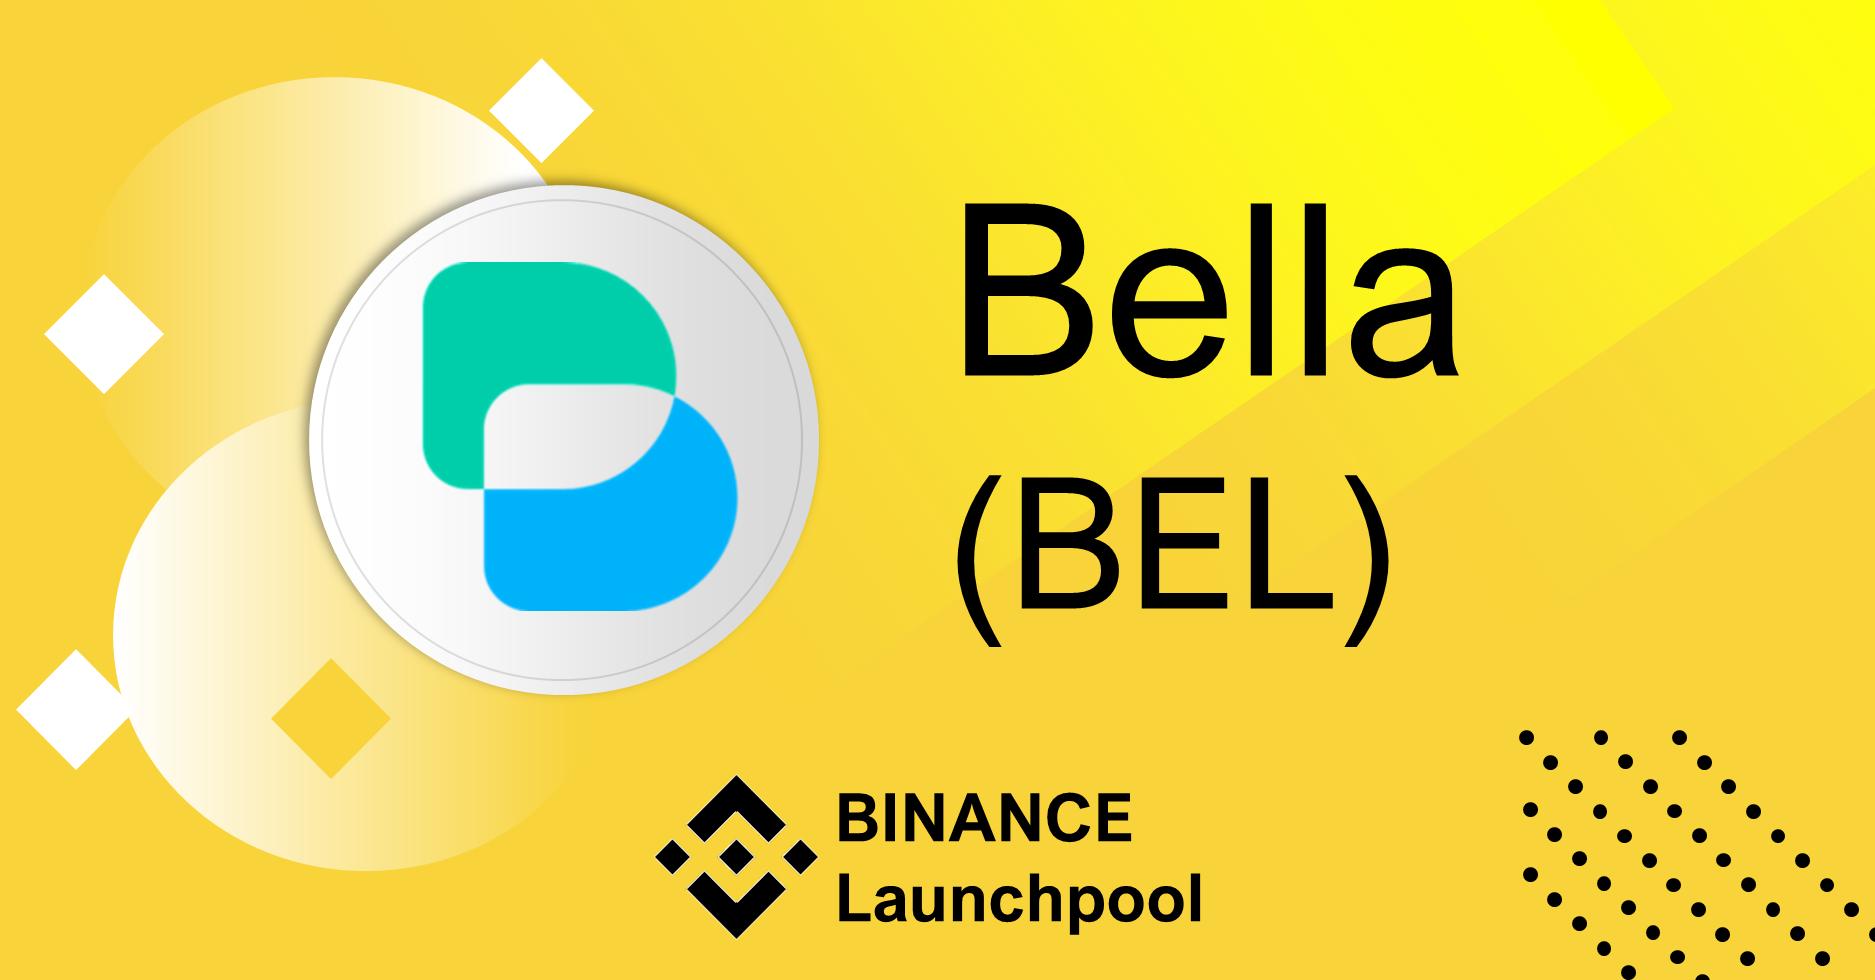 bella bel là gì